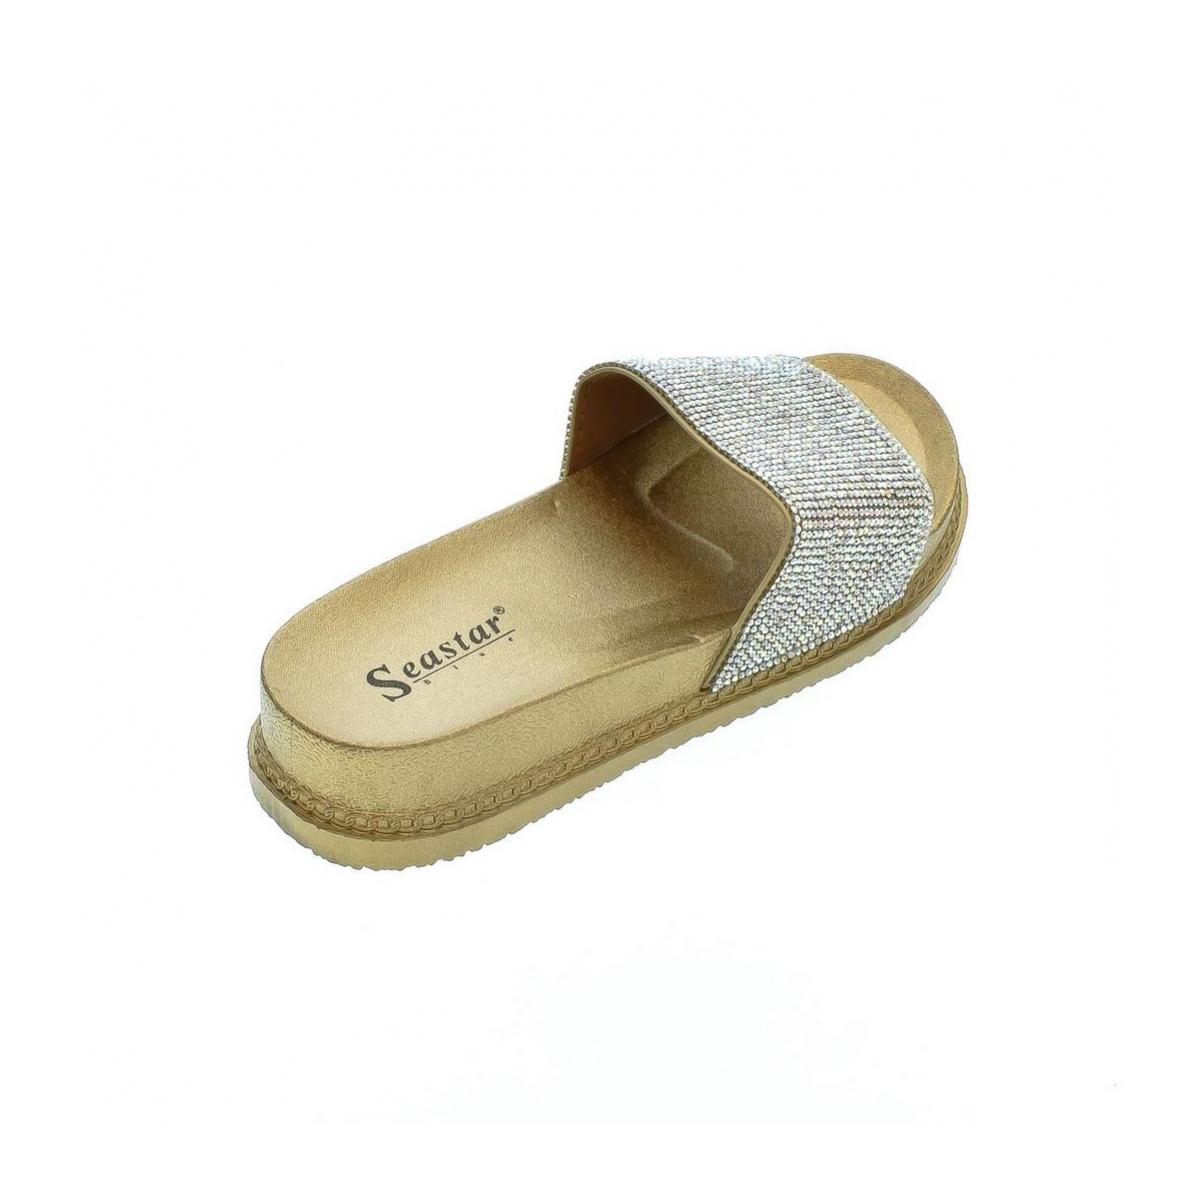 Dámske zlaté šľapky DANEA - 3 acebd1555c1